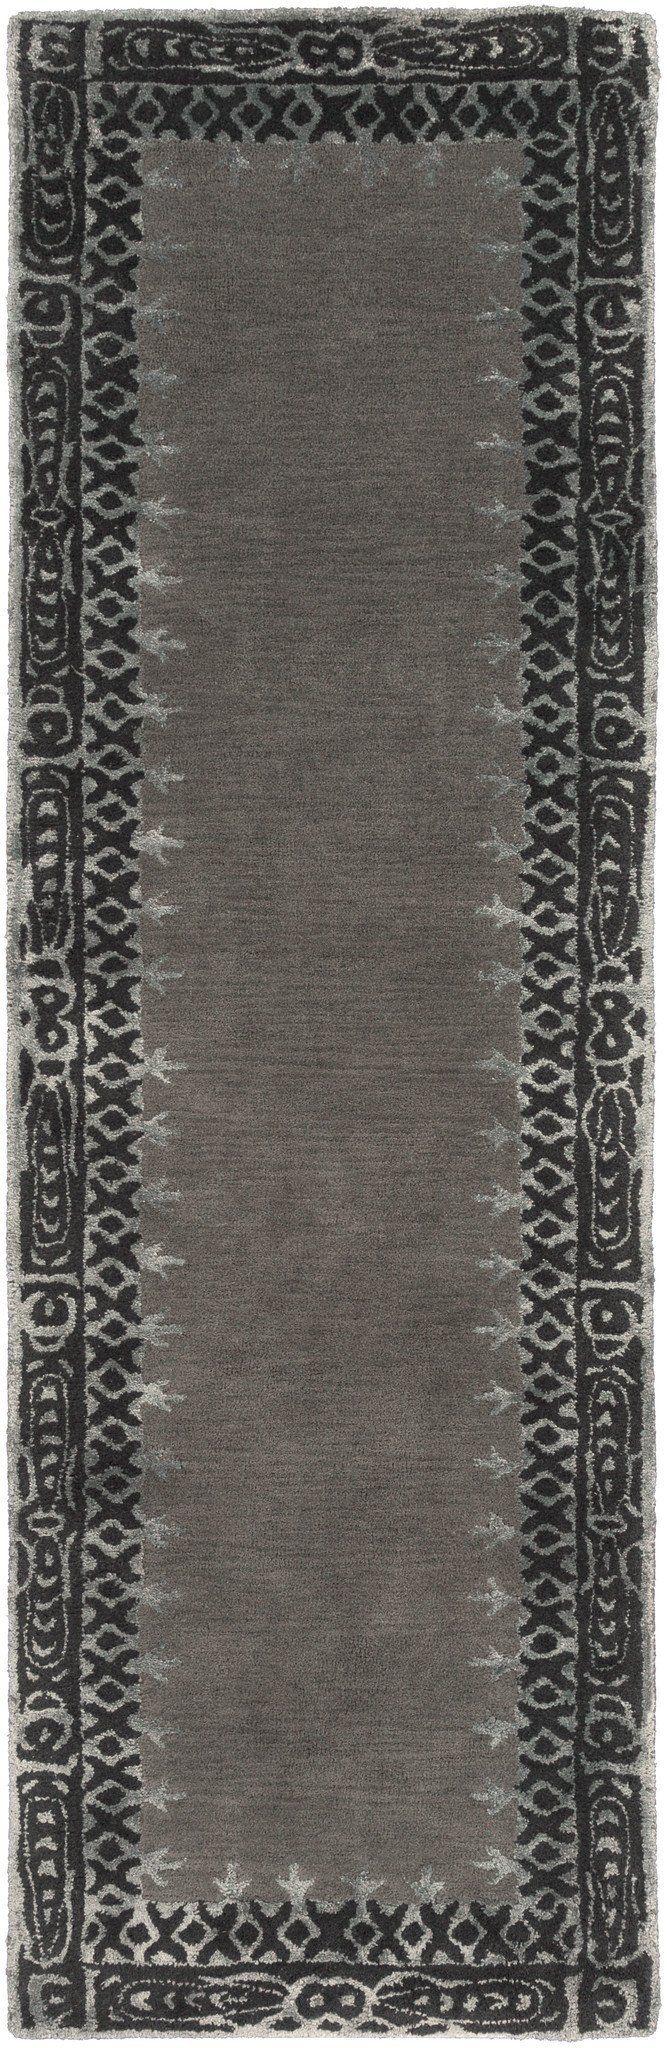 Surya Henna HEN1009 Grey/Black Floral and Paisley Area Rug